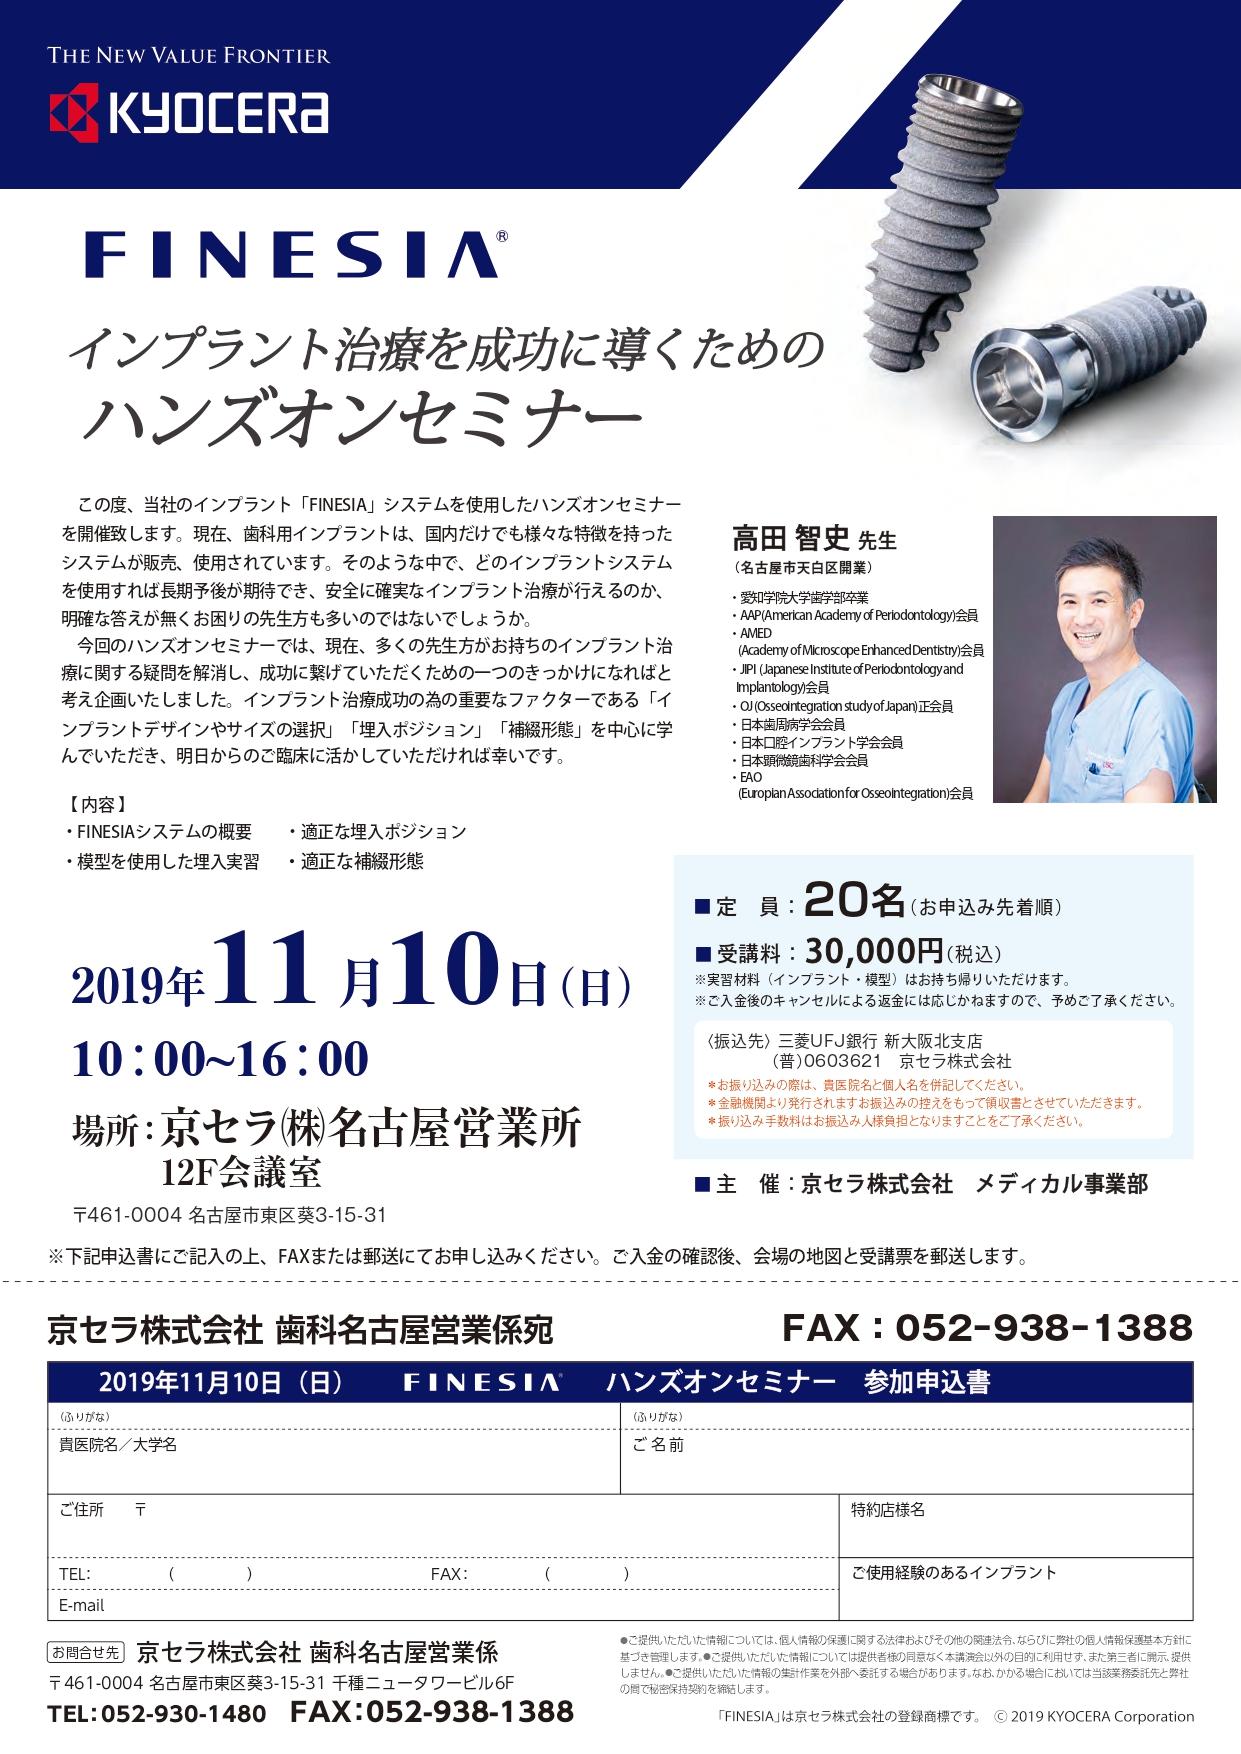 FINESIA インプラント治療を成功に導くための ハンズオンセミナー